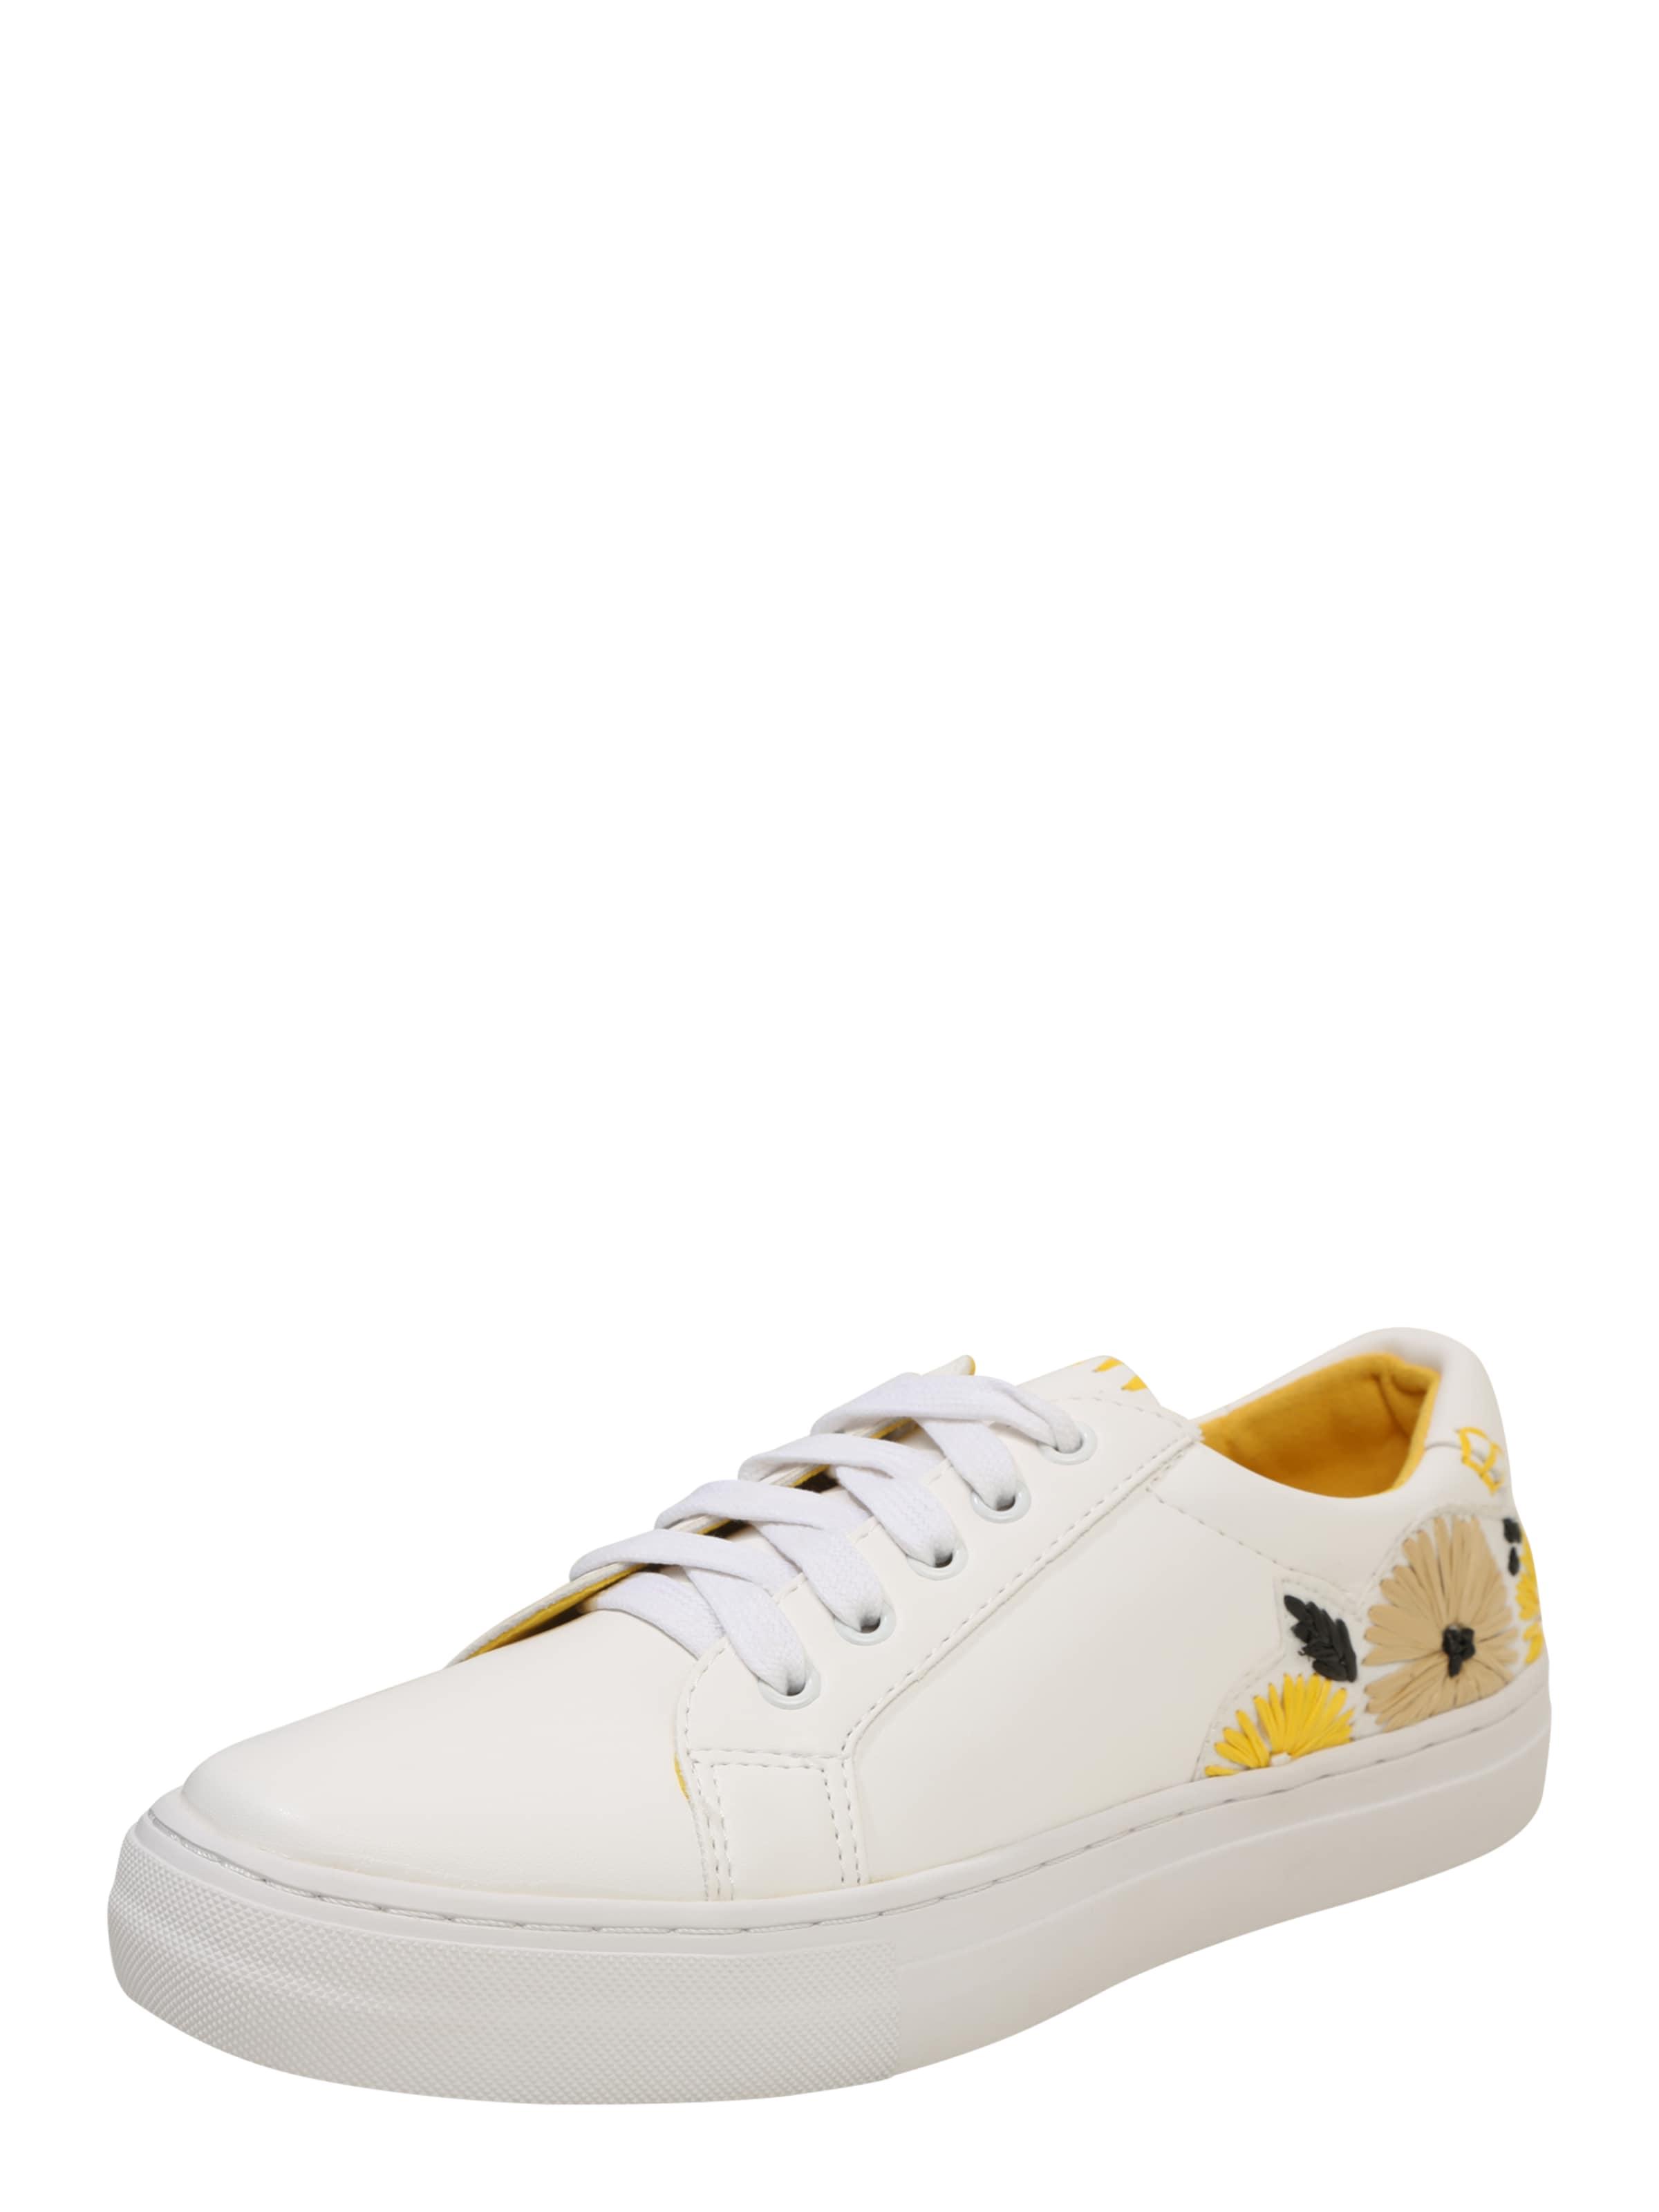 Haltbare Mode billige Schuhe Sixtyseven | Sneakers 'Pompei' Schuhe Gut getragene Schuhe